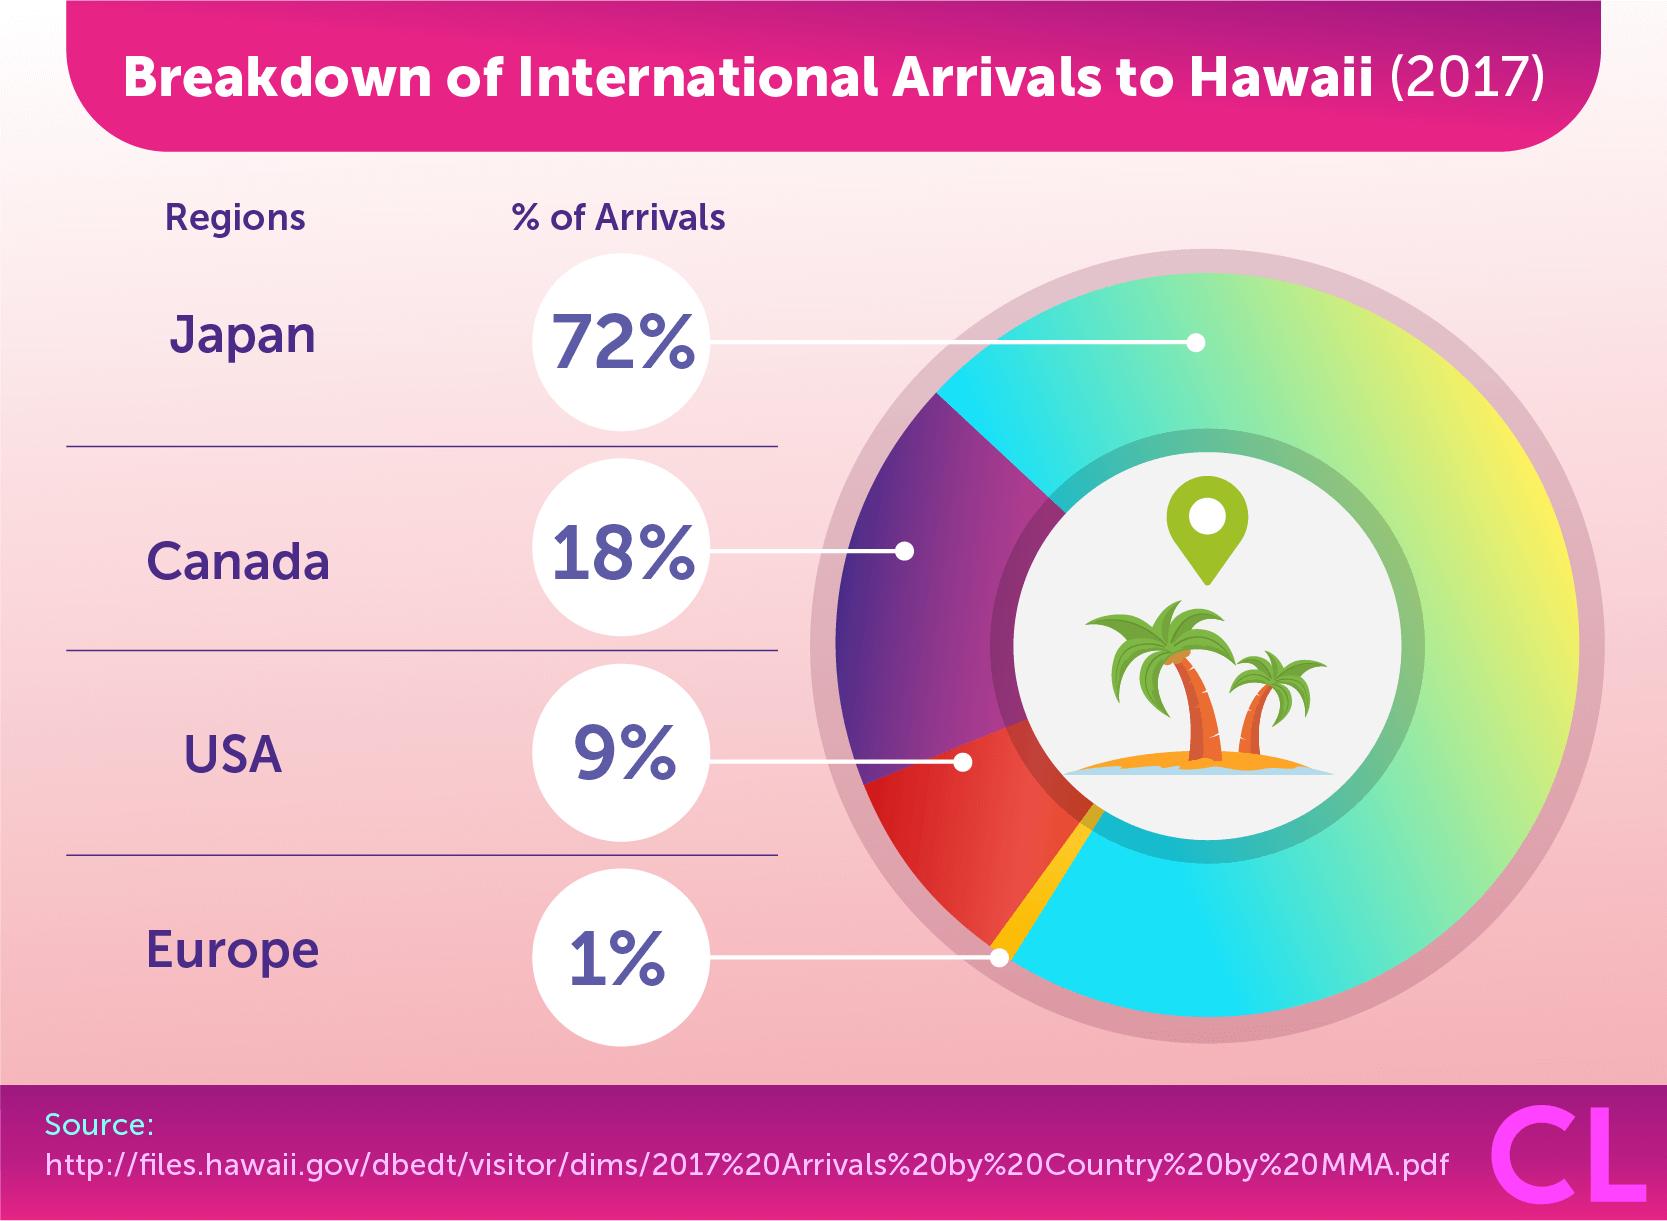 Breakdown of International Arrivals to Hawaii